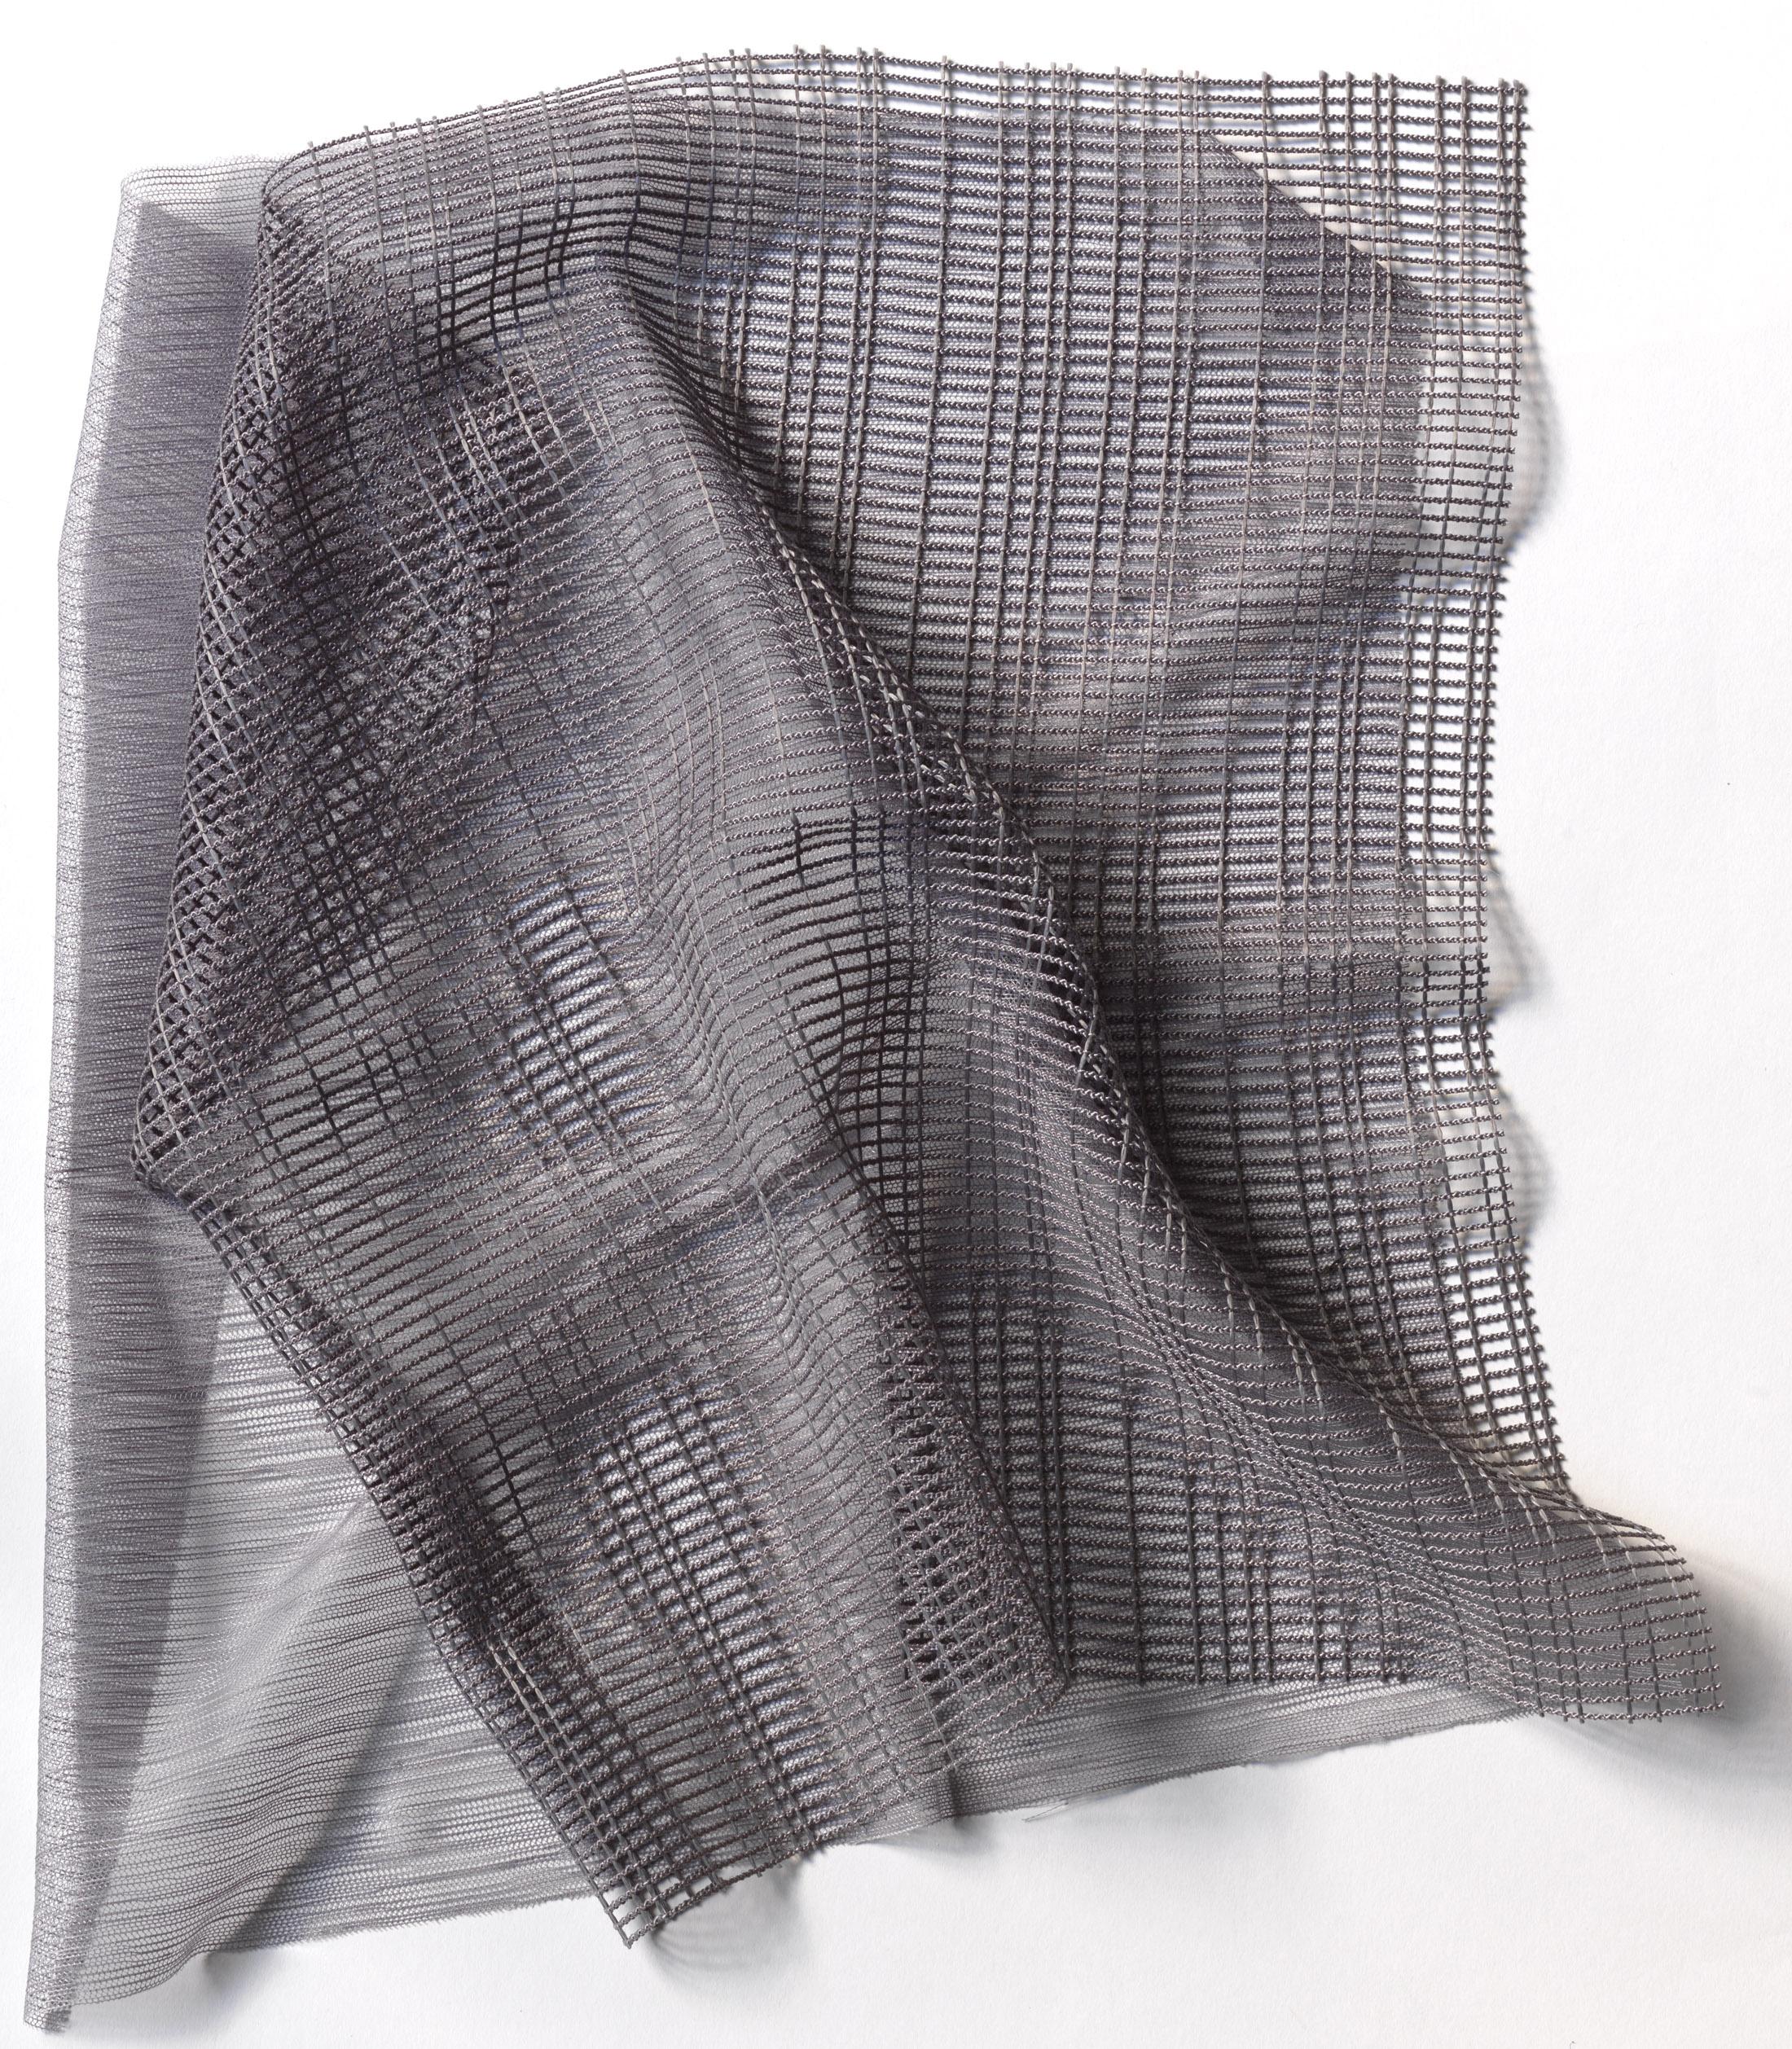 tulum co patio smsender drape pinch louver drapes pleat curtains door